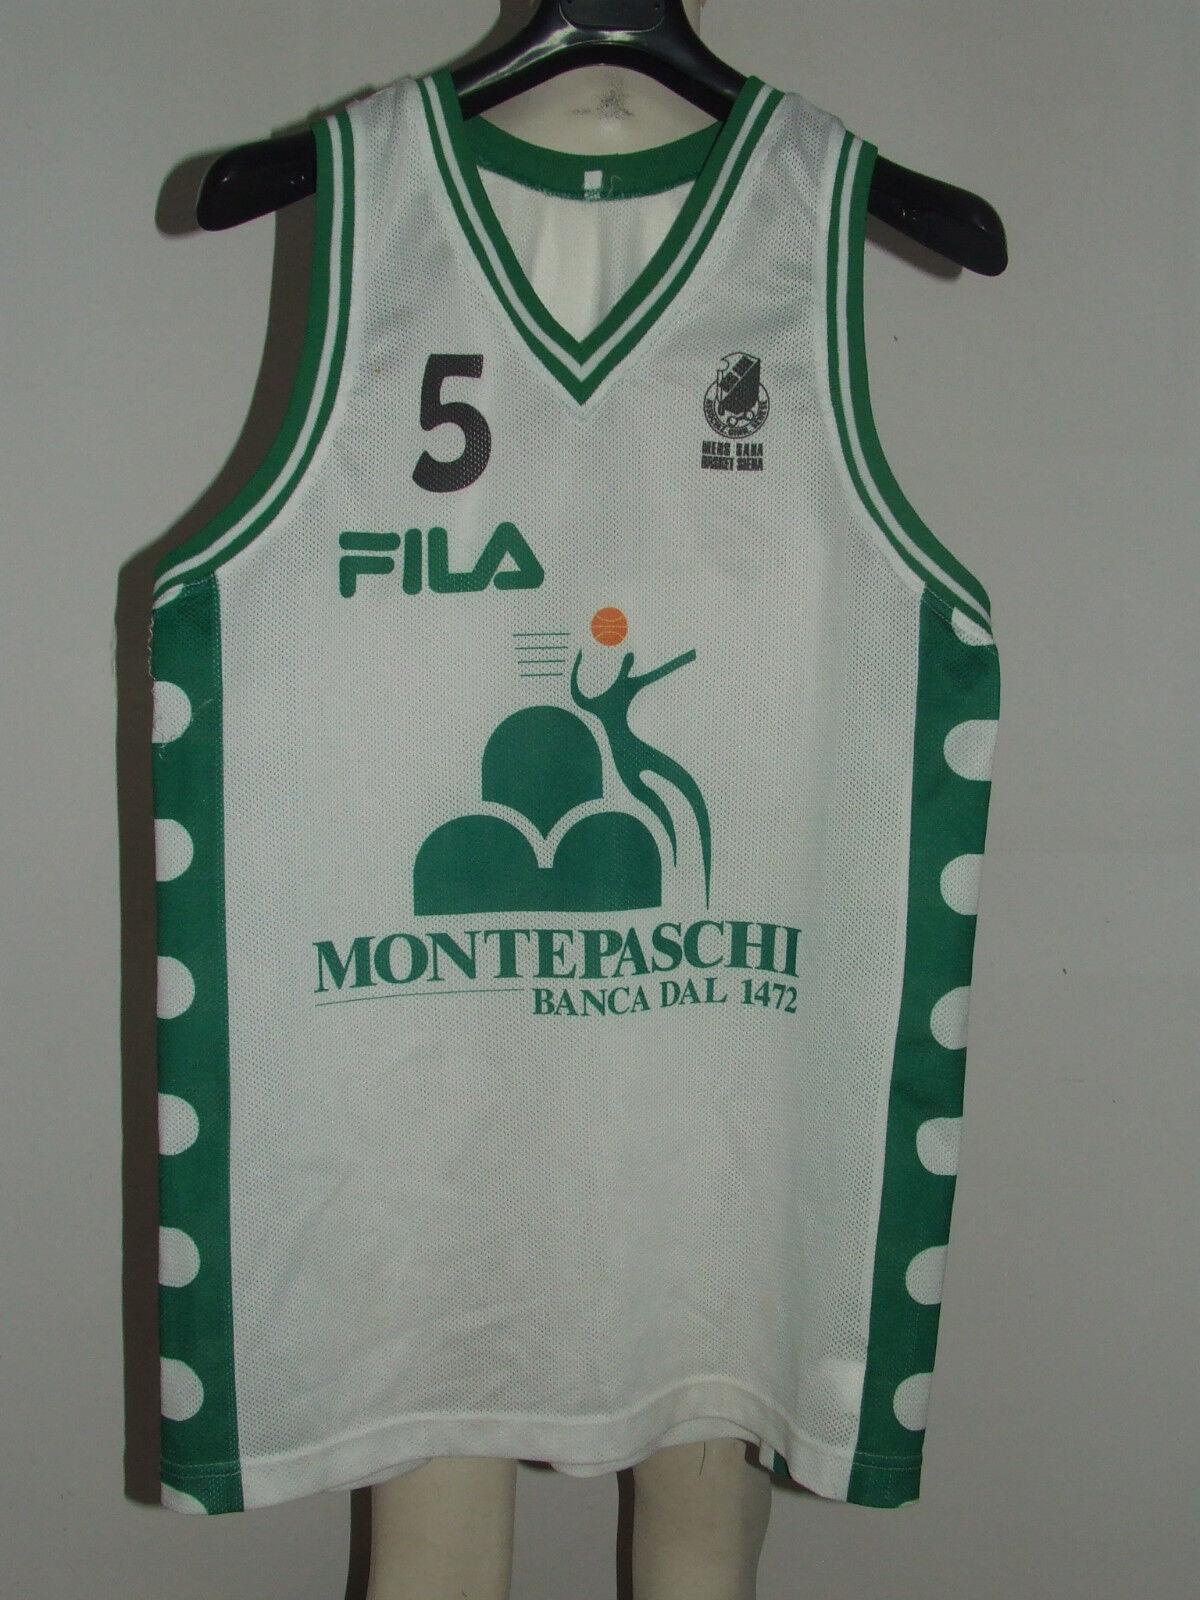 Trikot Maillot Trägerhemd Sport Basketball matchworn matchworn matchworn mens Sana Siena No. 5 aab373